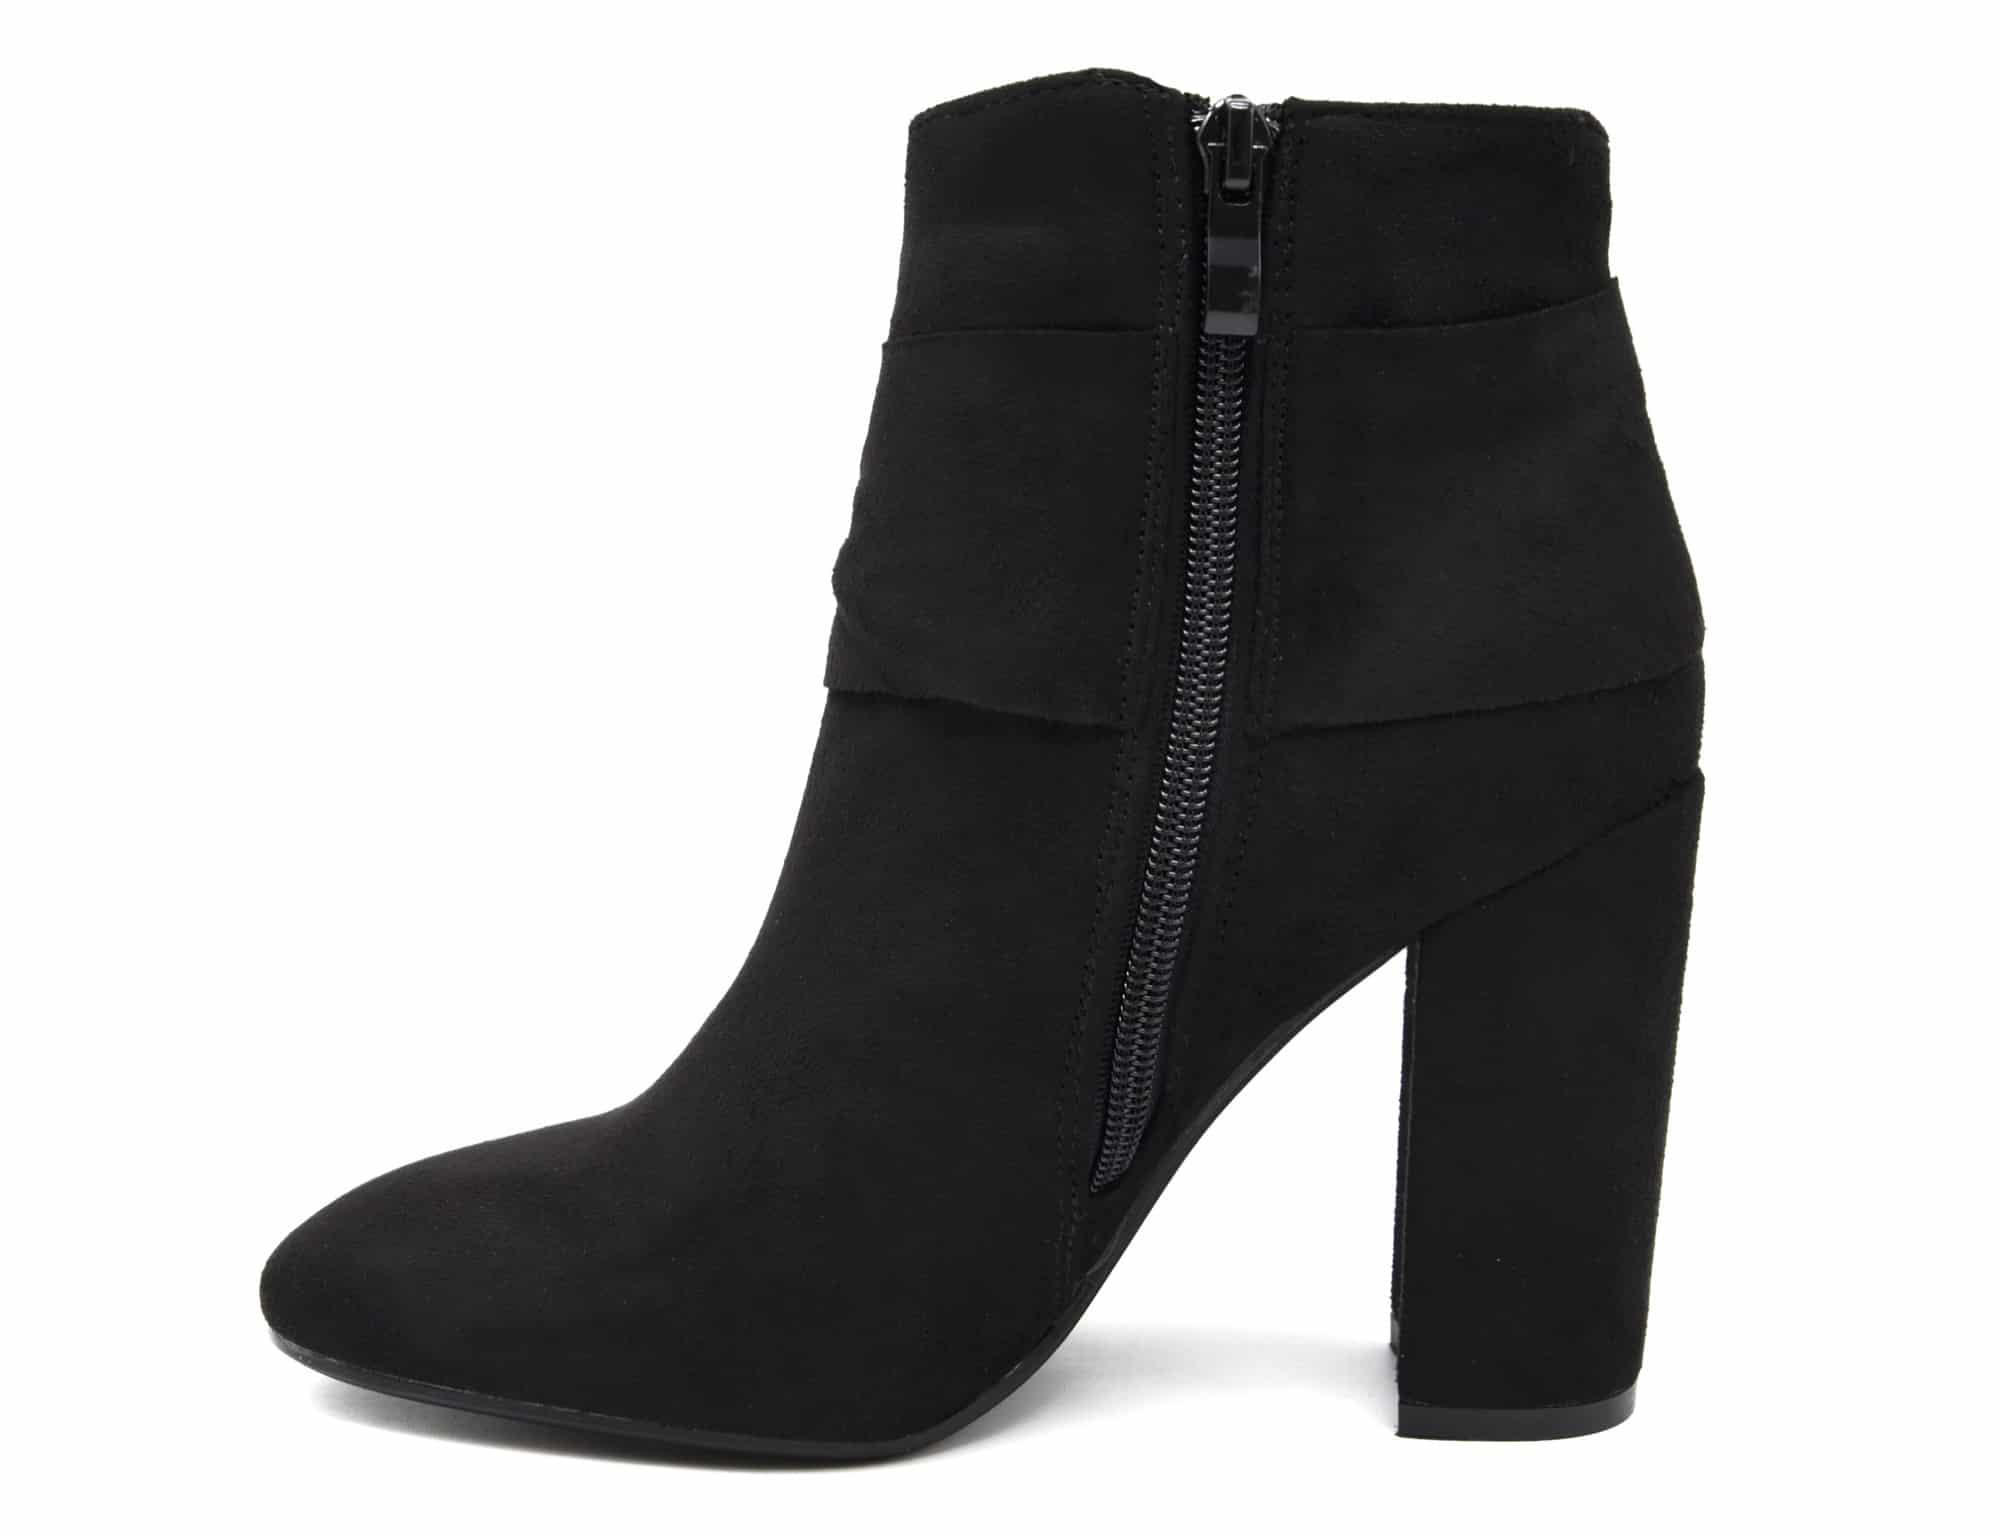 shf98 bottines boots effet daim avec talon carr et. Black Bedroom Furniture Sets. Home Design Ideas